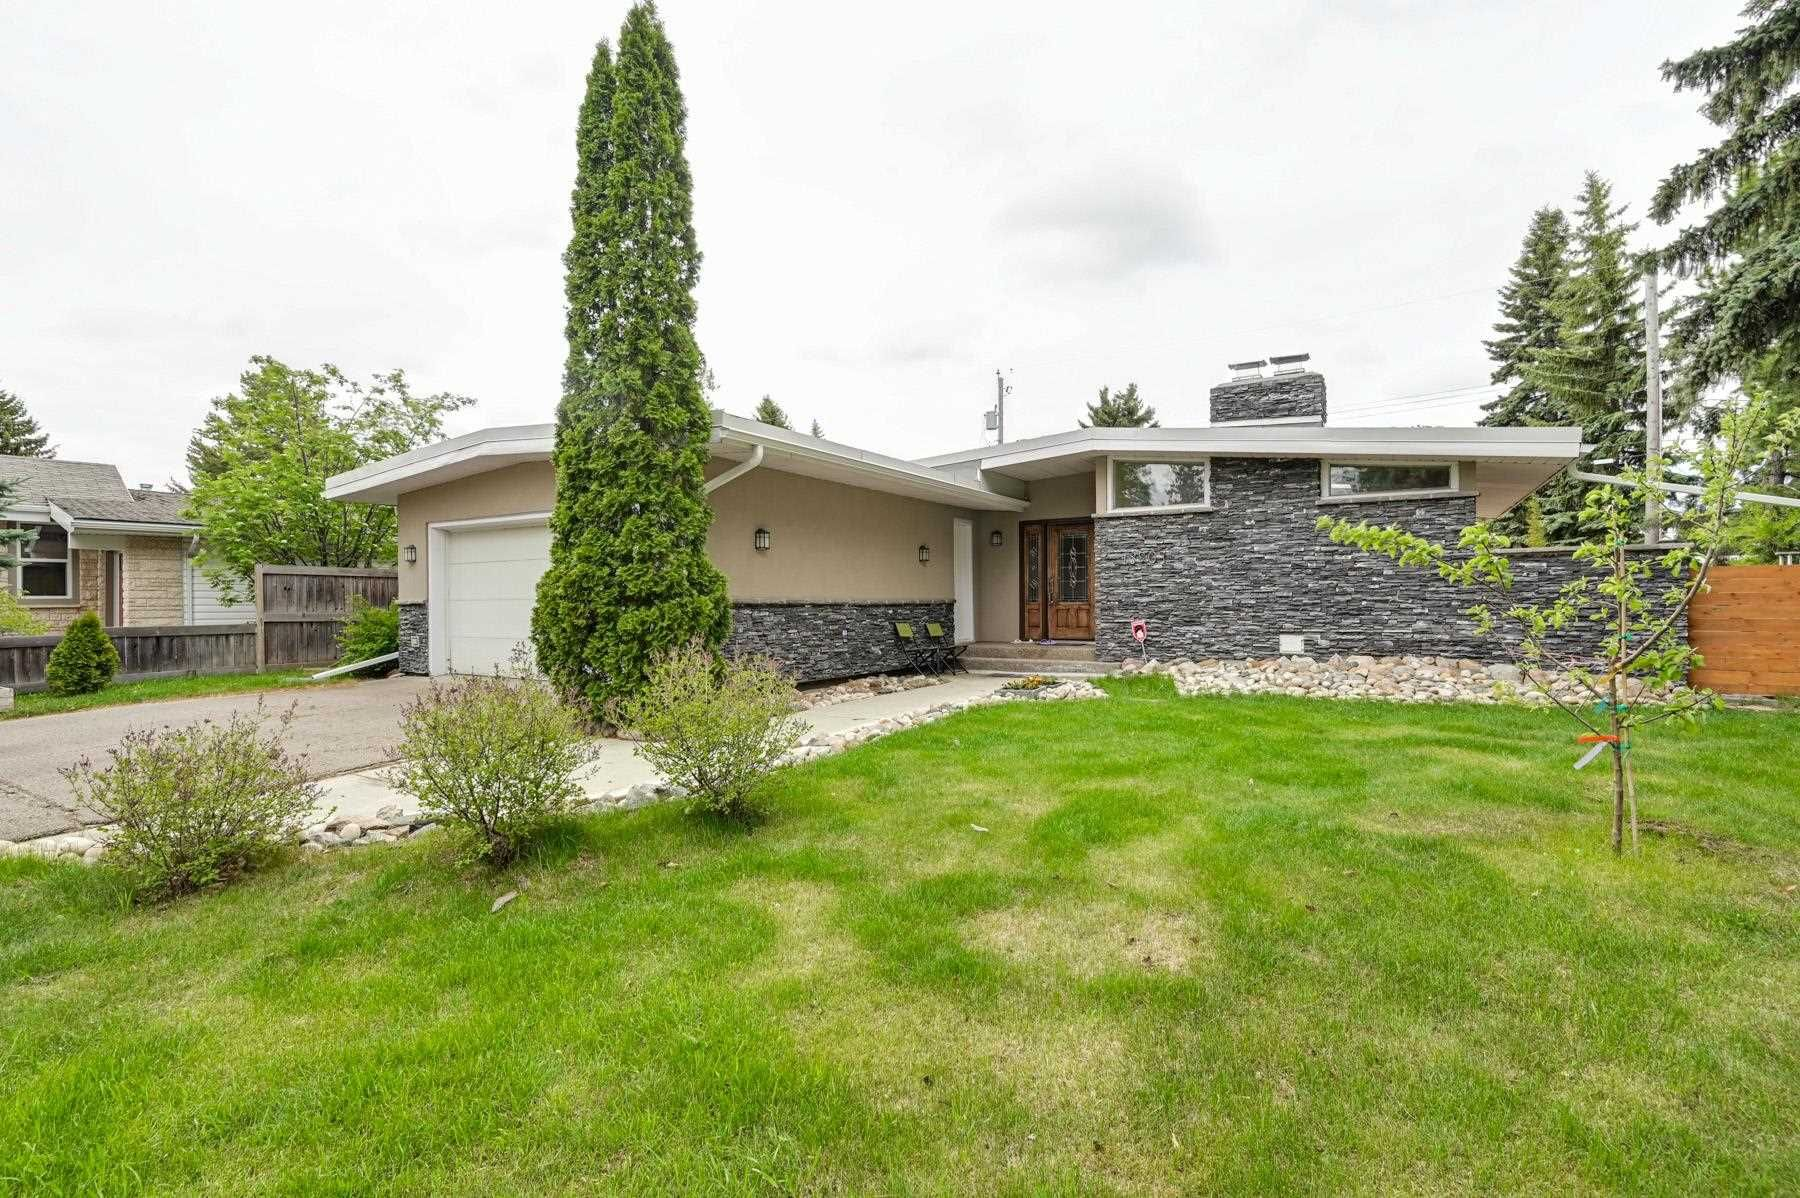 Main Photo: 13907 91 Avenue in Edmonton: Zone 10 House for sale : MLS®# E4246880